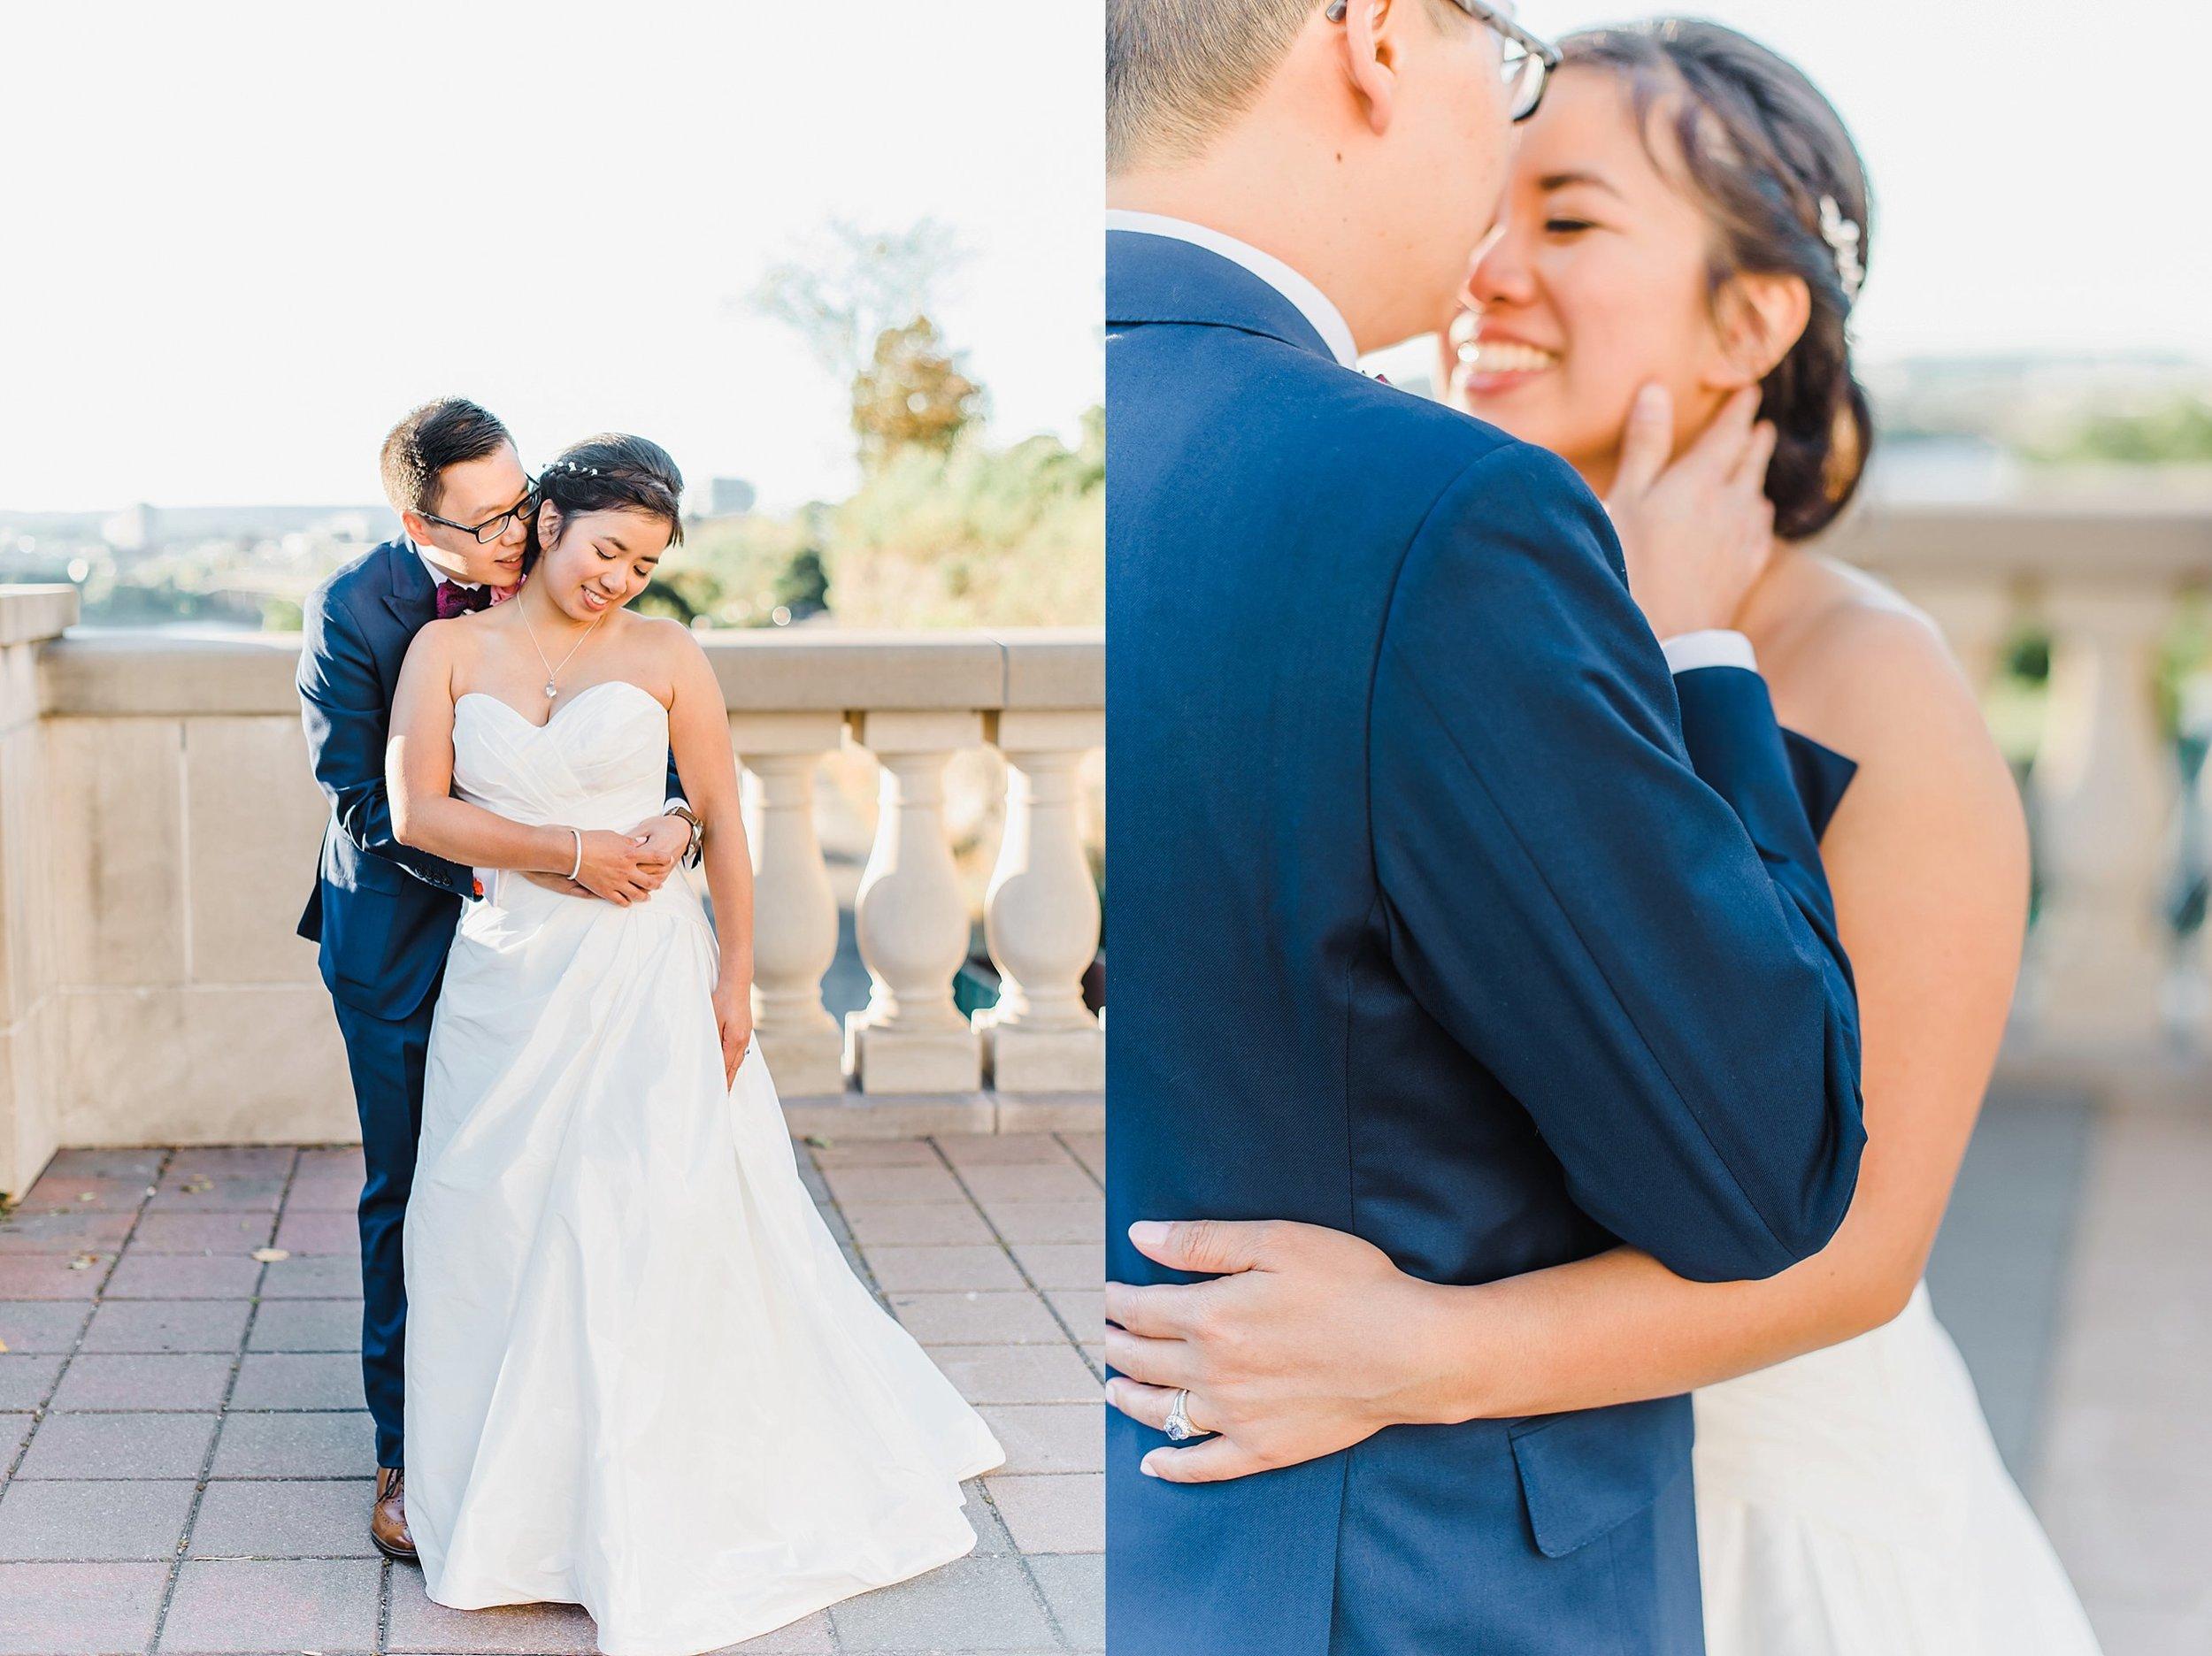 light airy indie fine art ottawa wedding photographer | Ali and Batoul Photography_1551.jpg